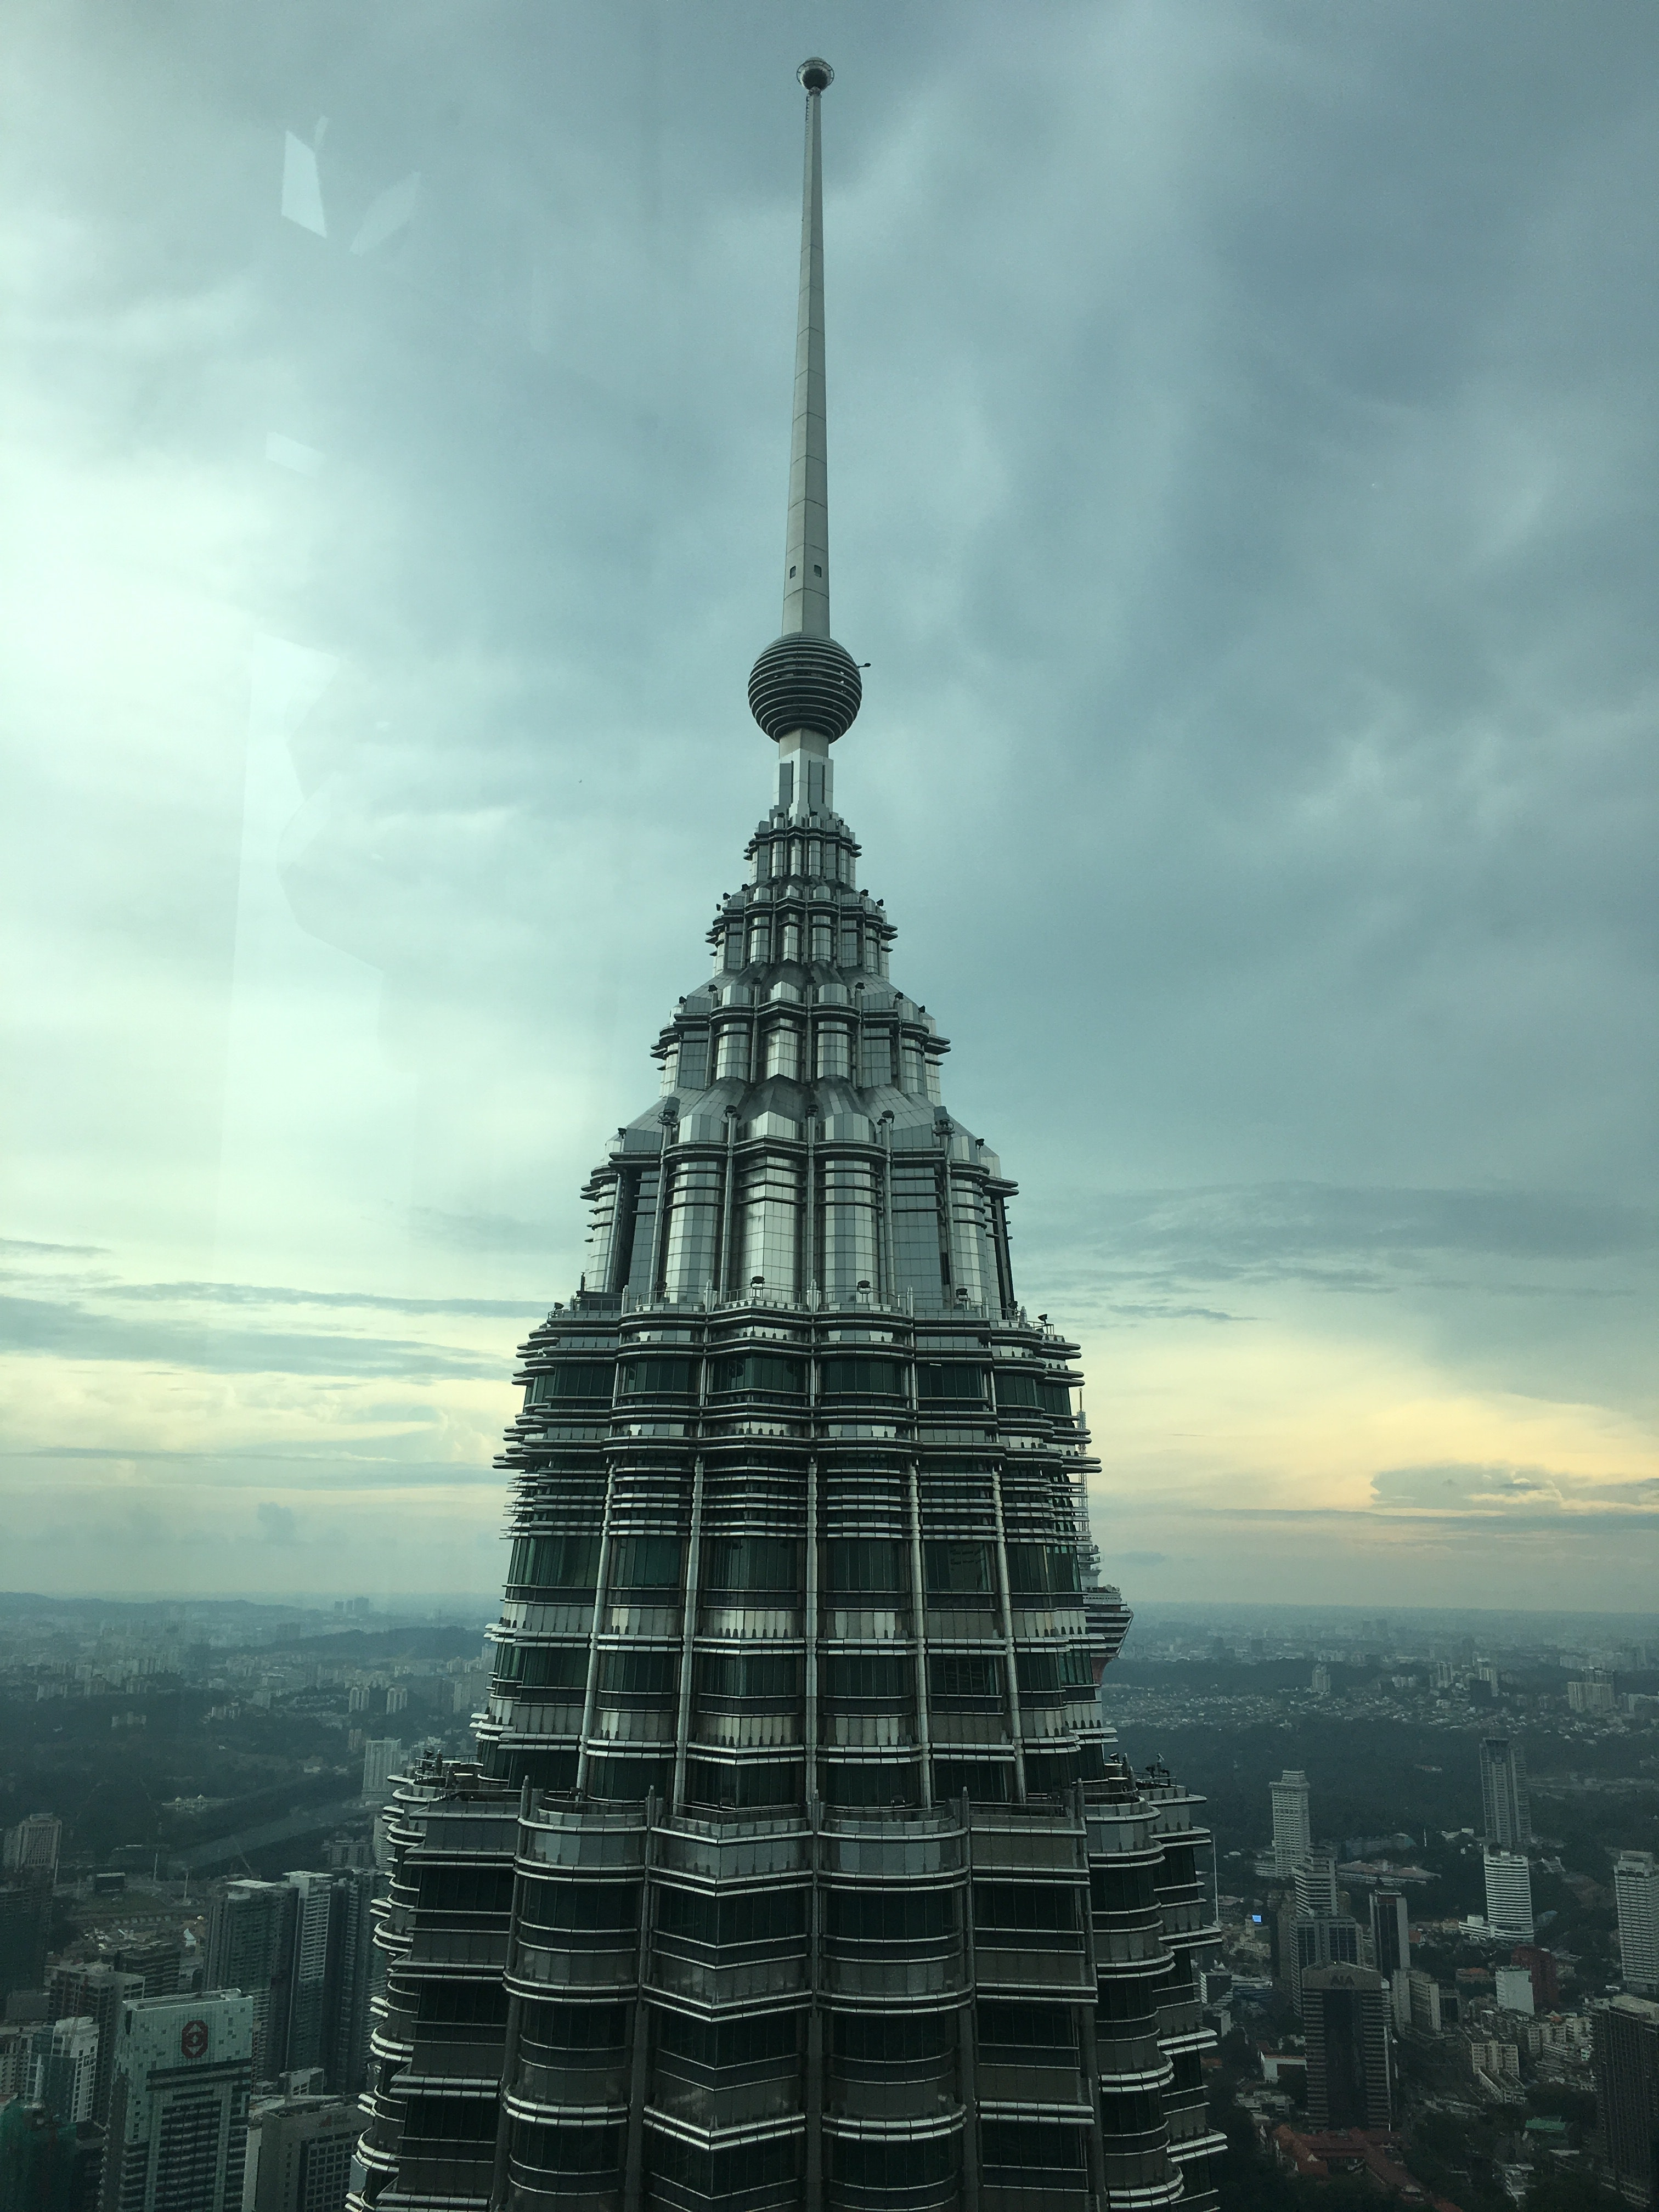 Tower building landmark under cloudy sky photo